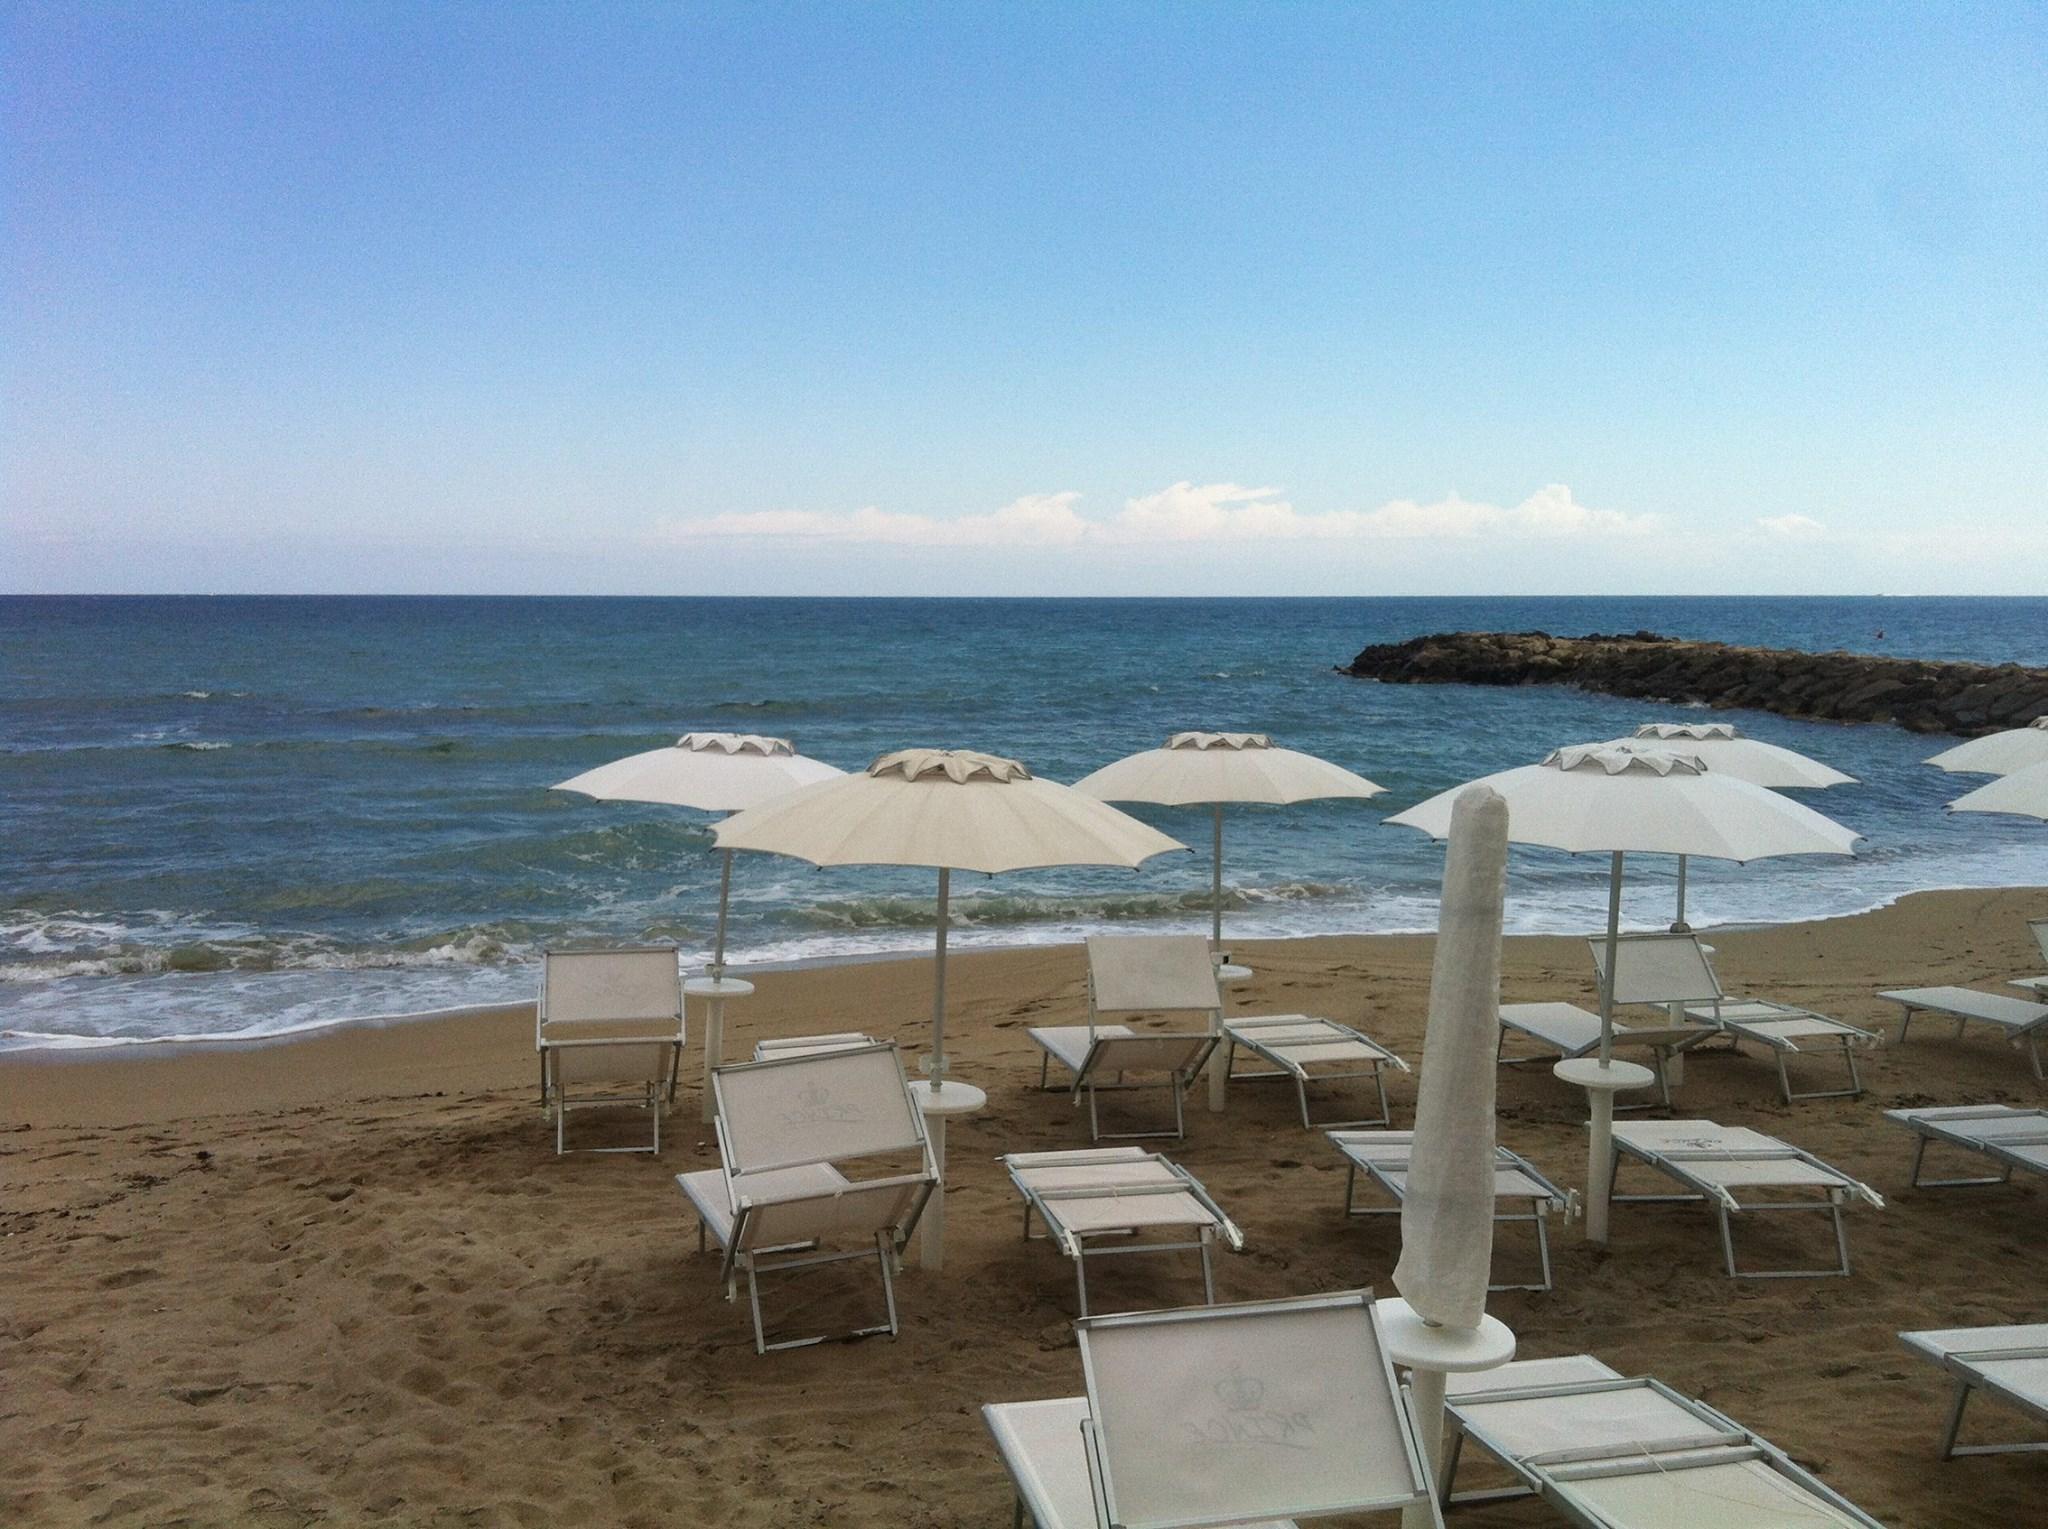 Lido Pevero Beach